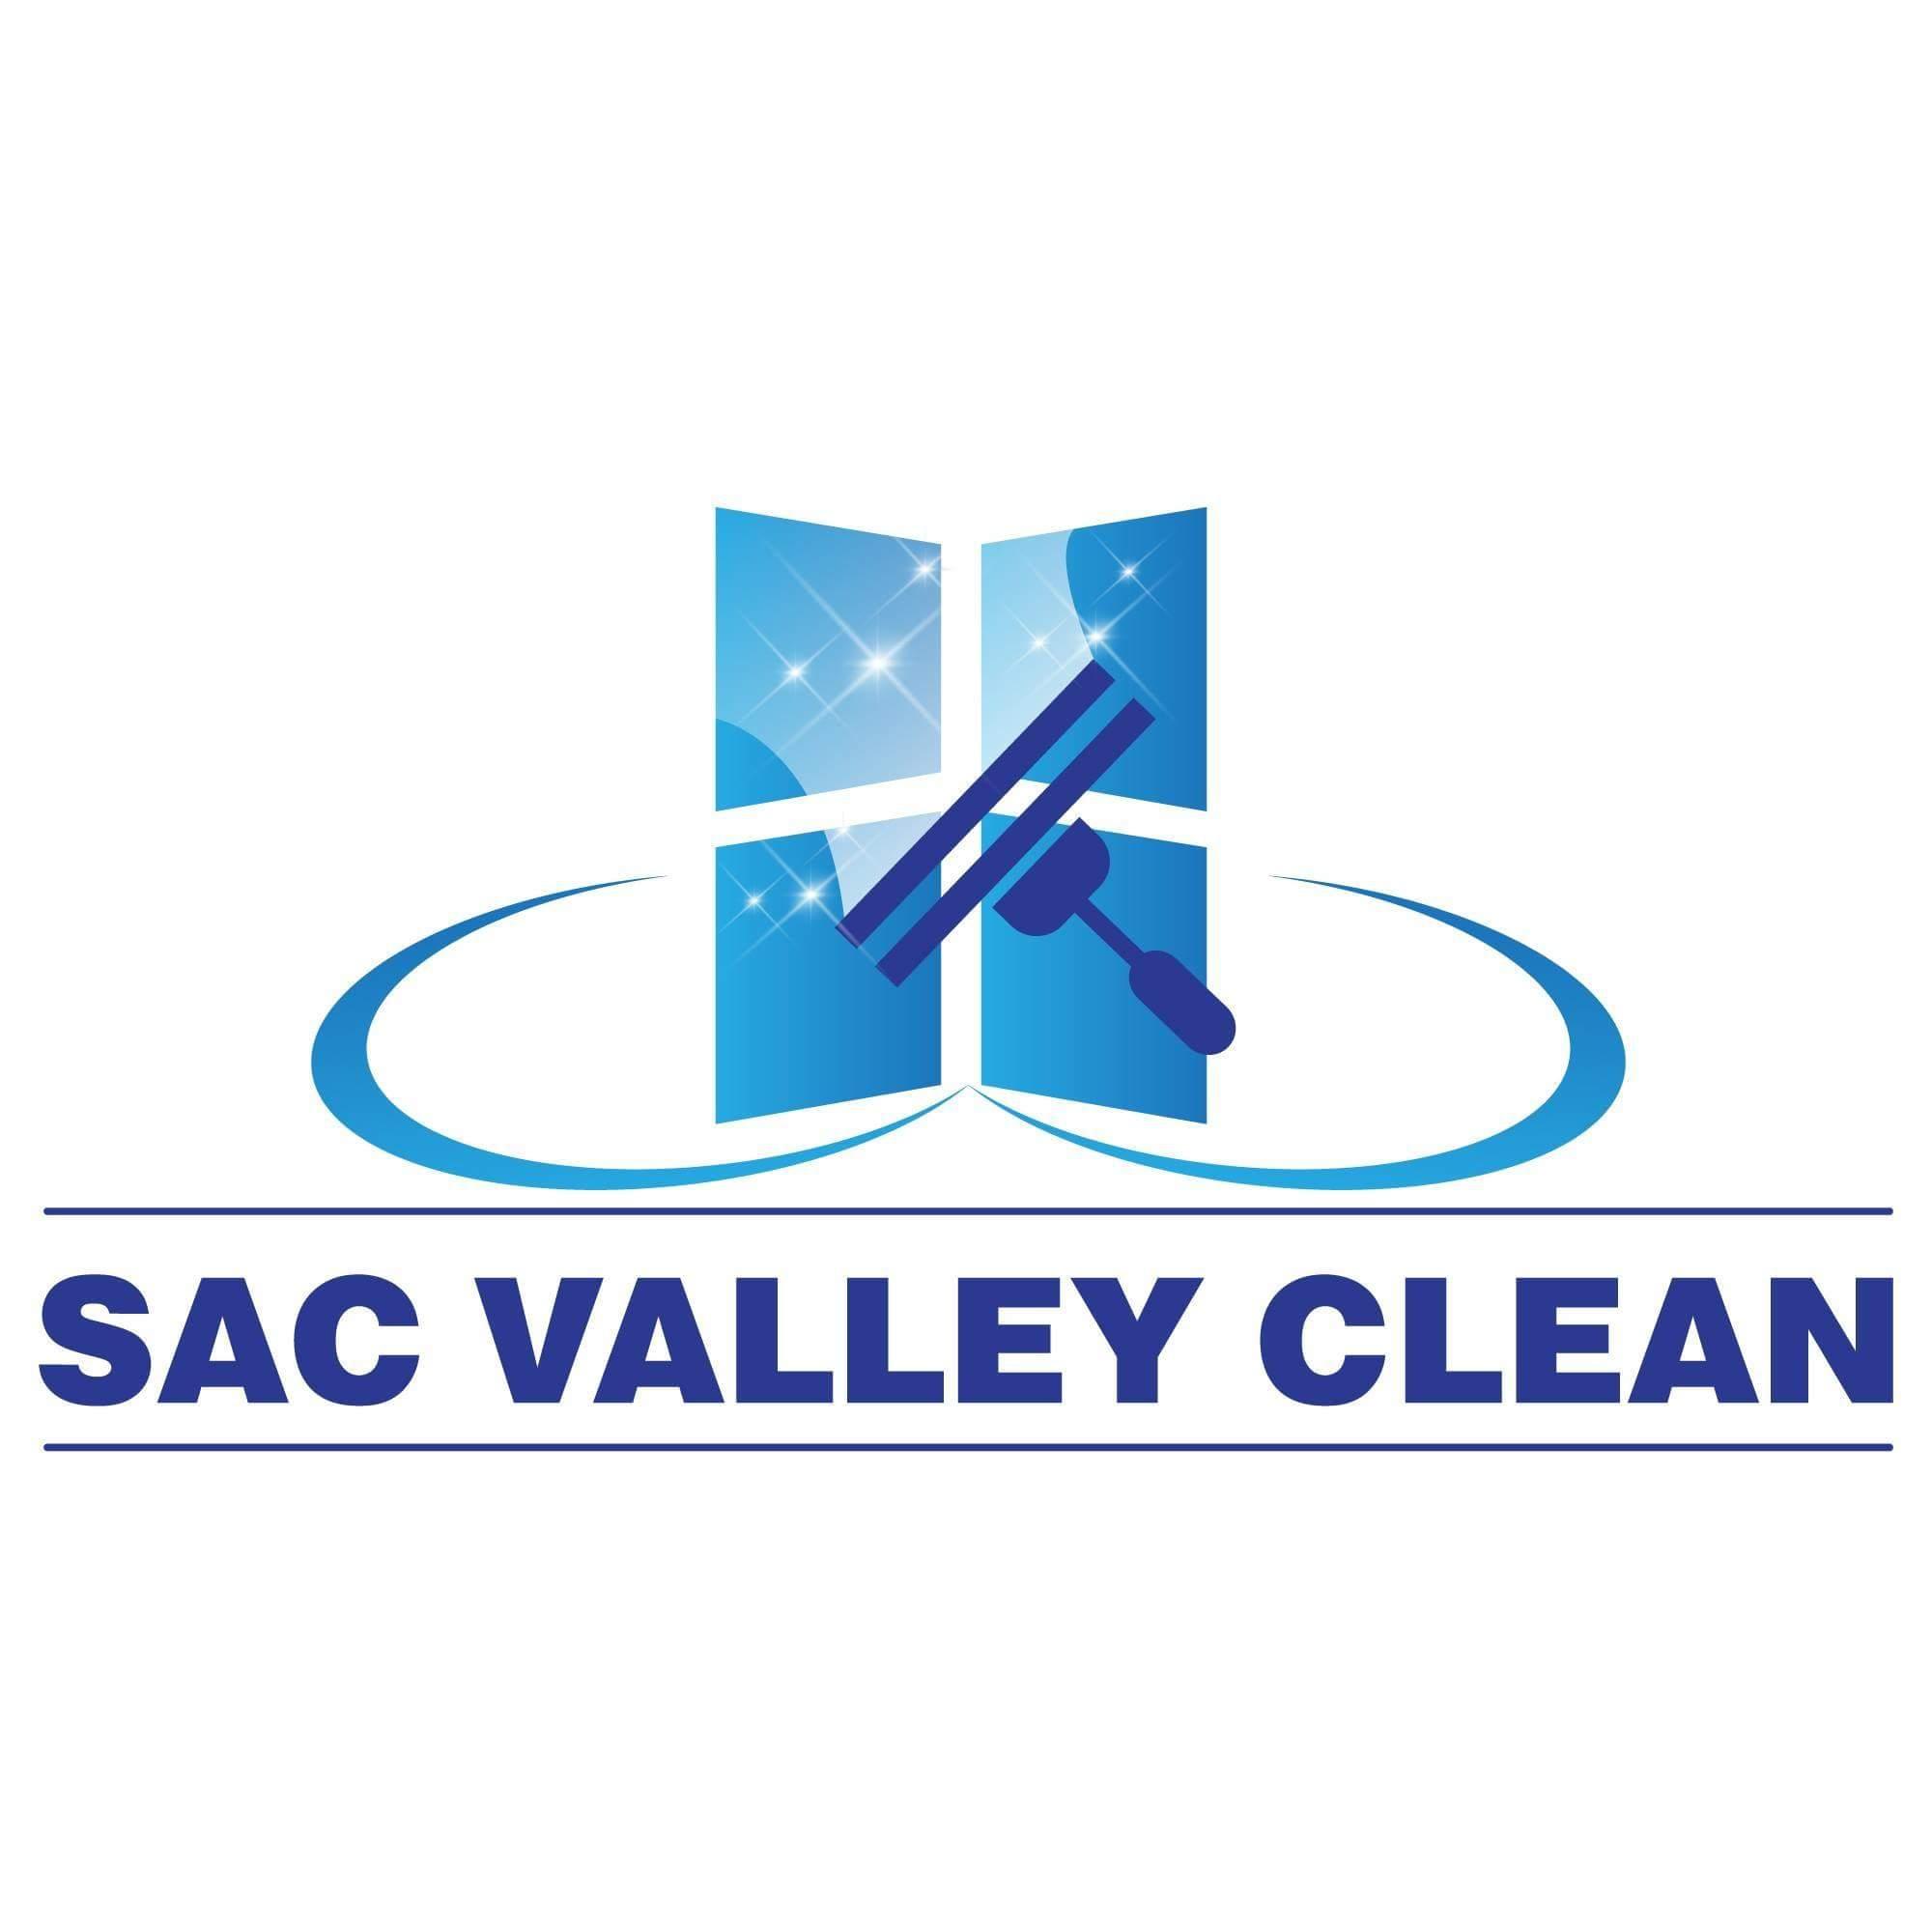 Sac Valley Clean